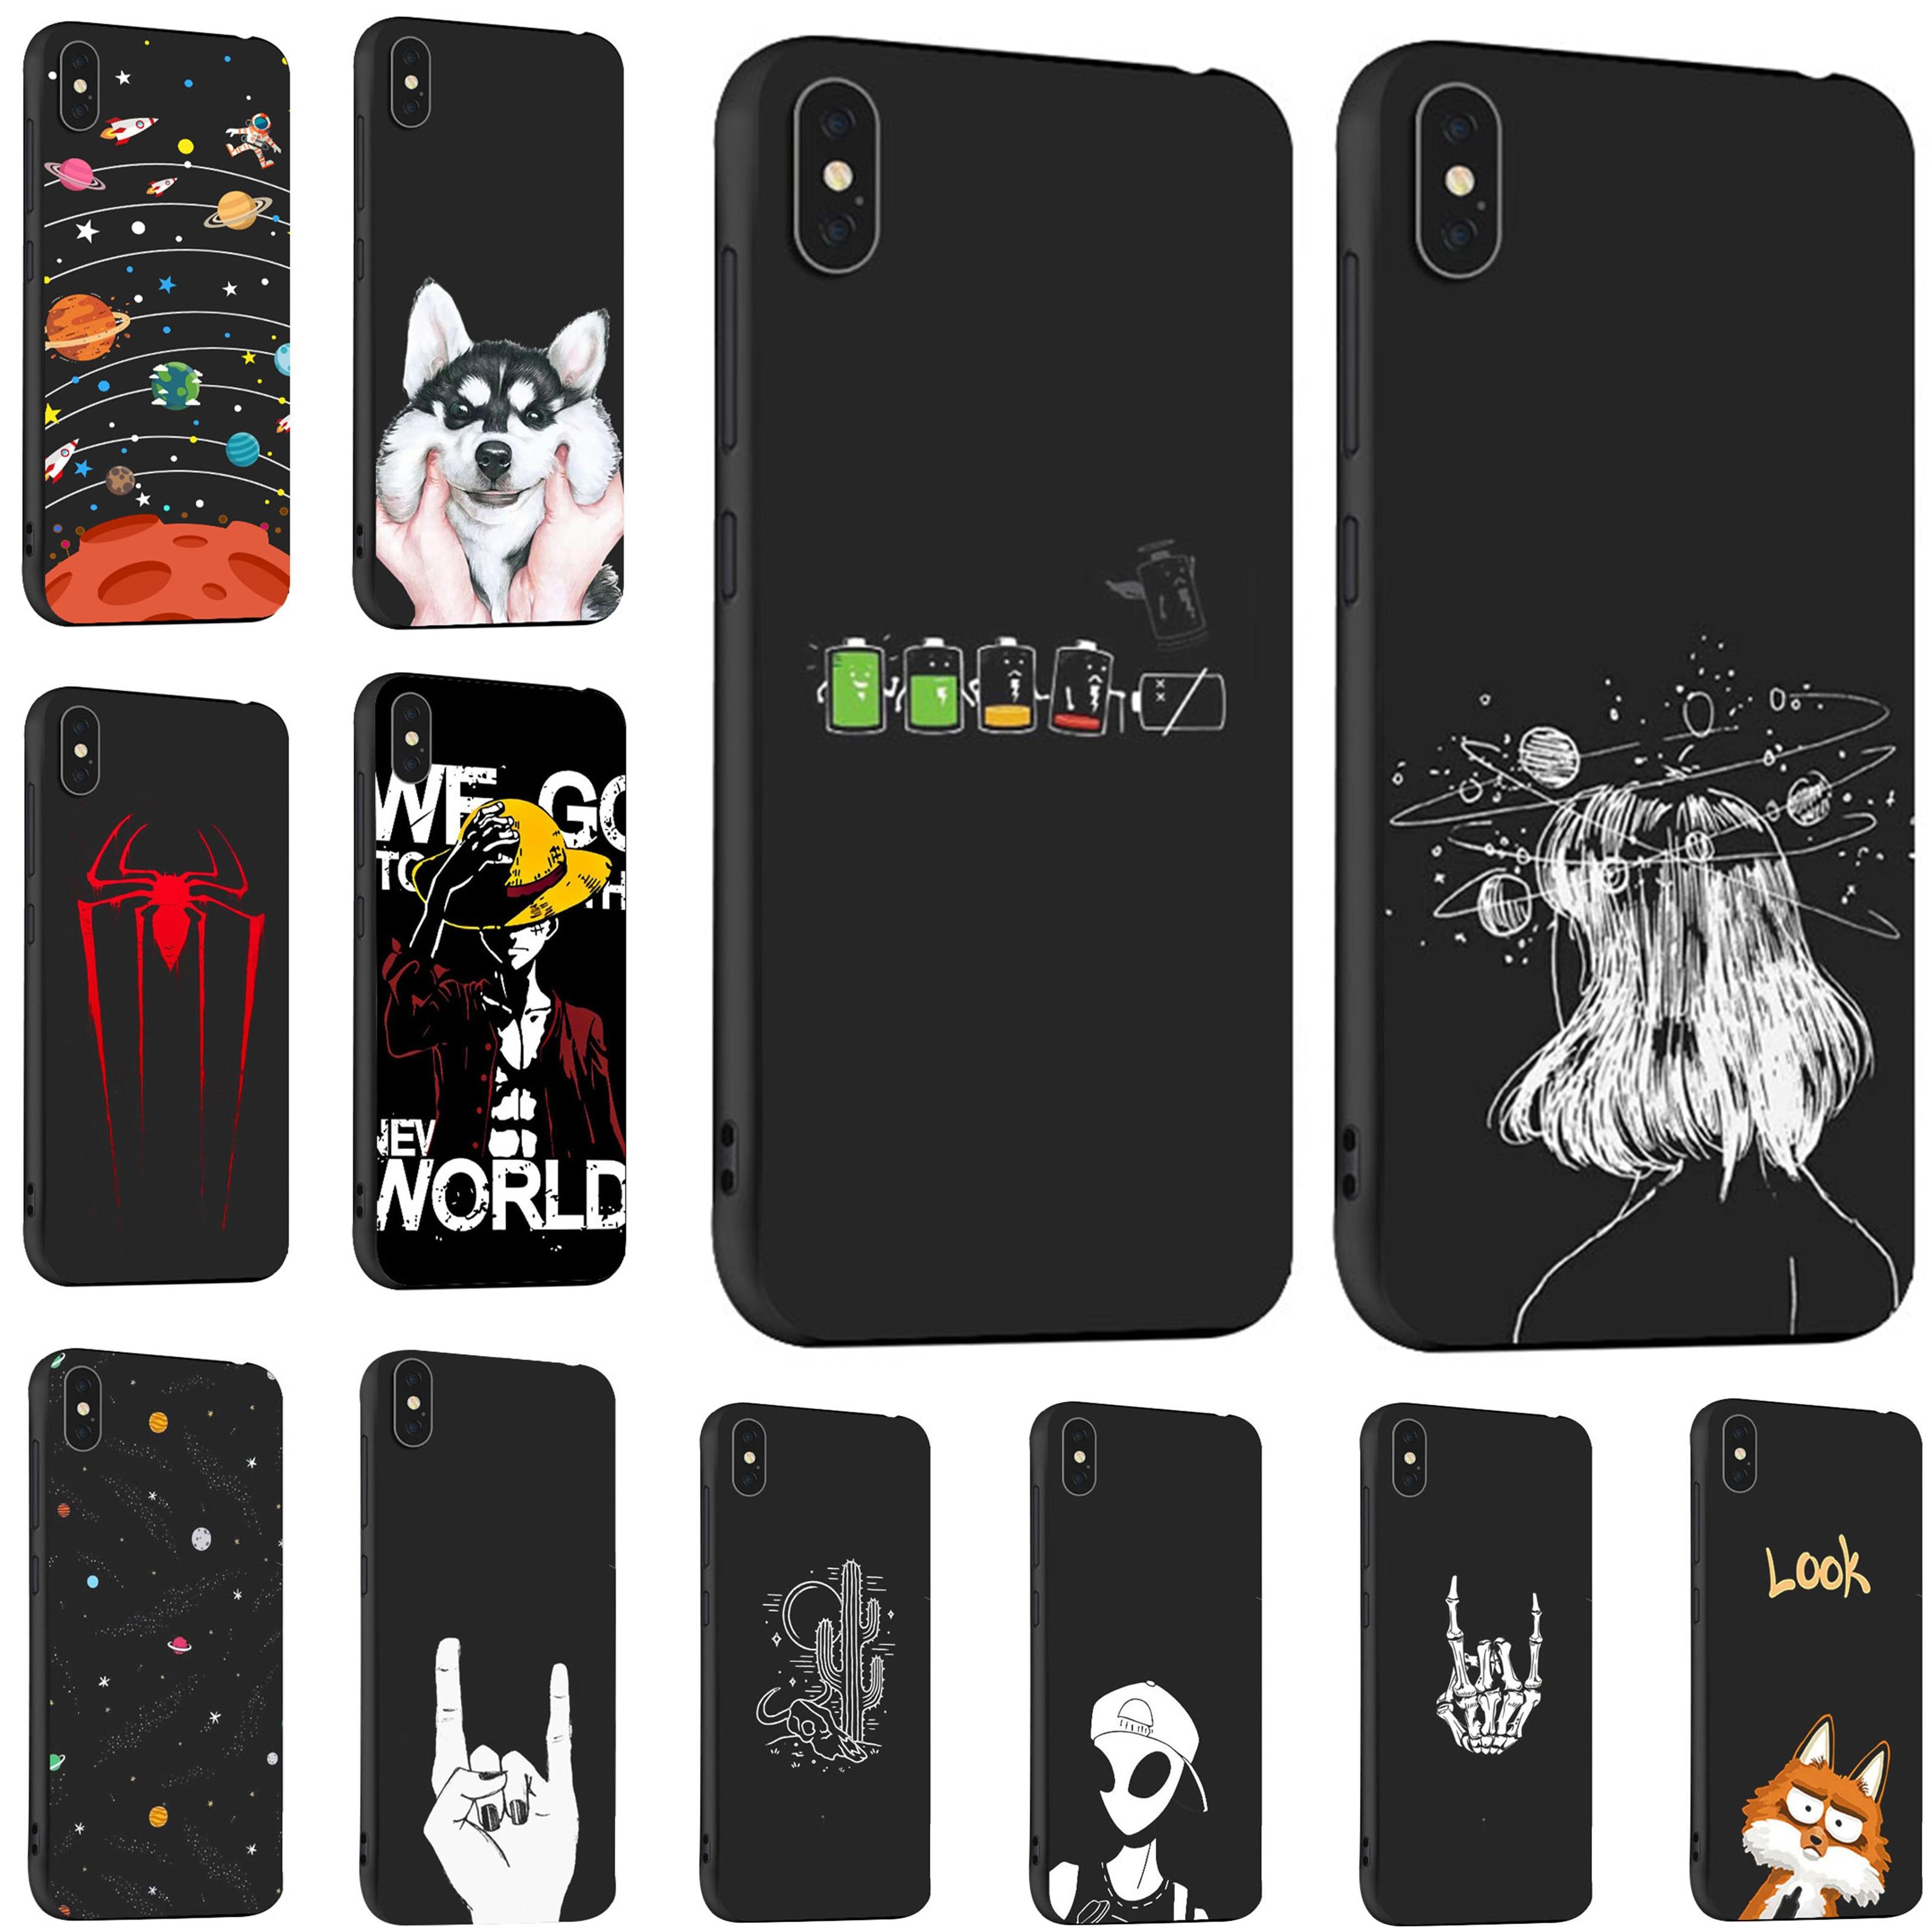 Black Mobile Phone Cases For Lenovo A5 A5000 K350t K5 Note Play Pro K5S K320T P70 A319 S5 S850 Z5s Lite Z6 Youth Cover bag